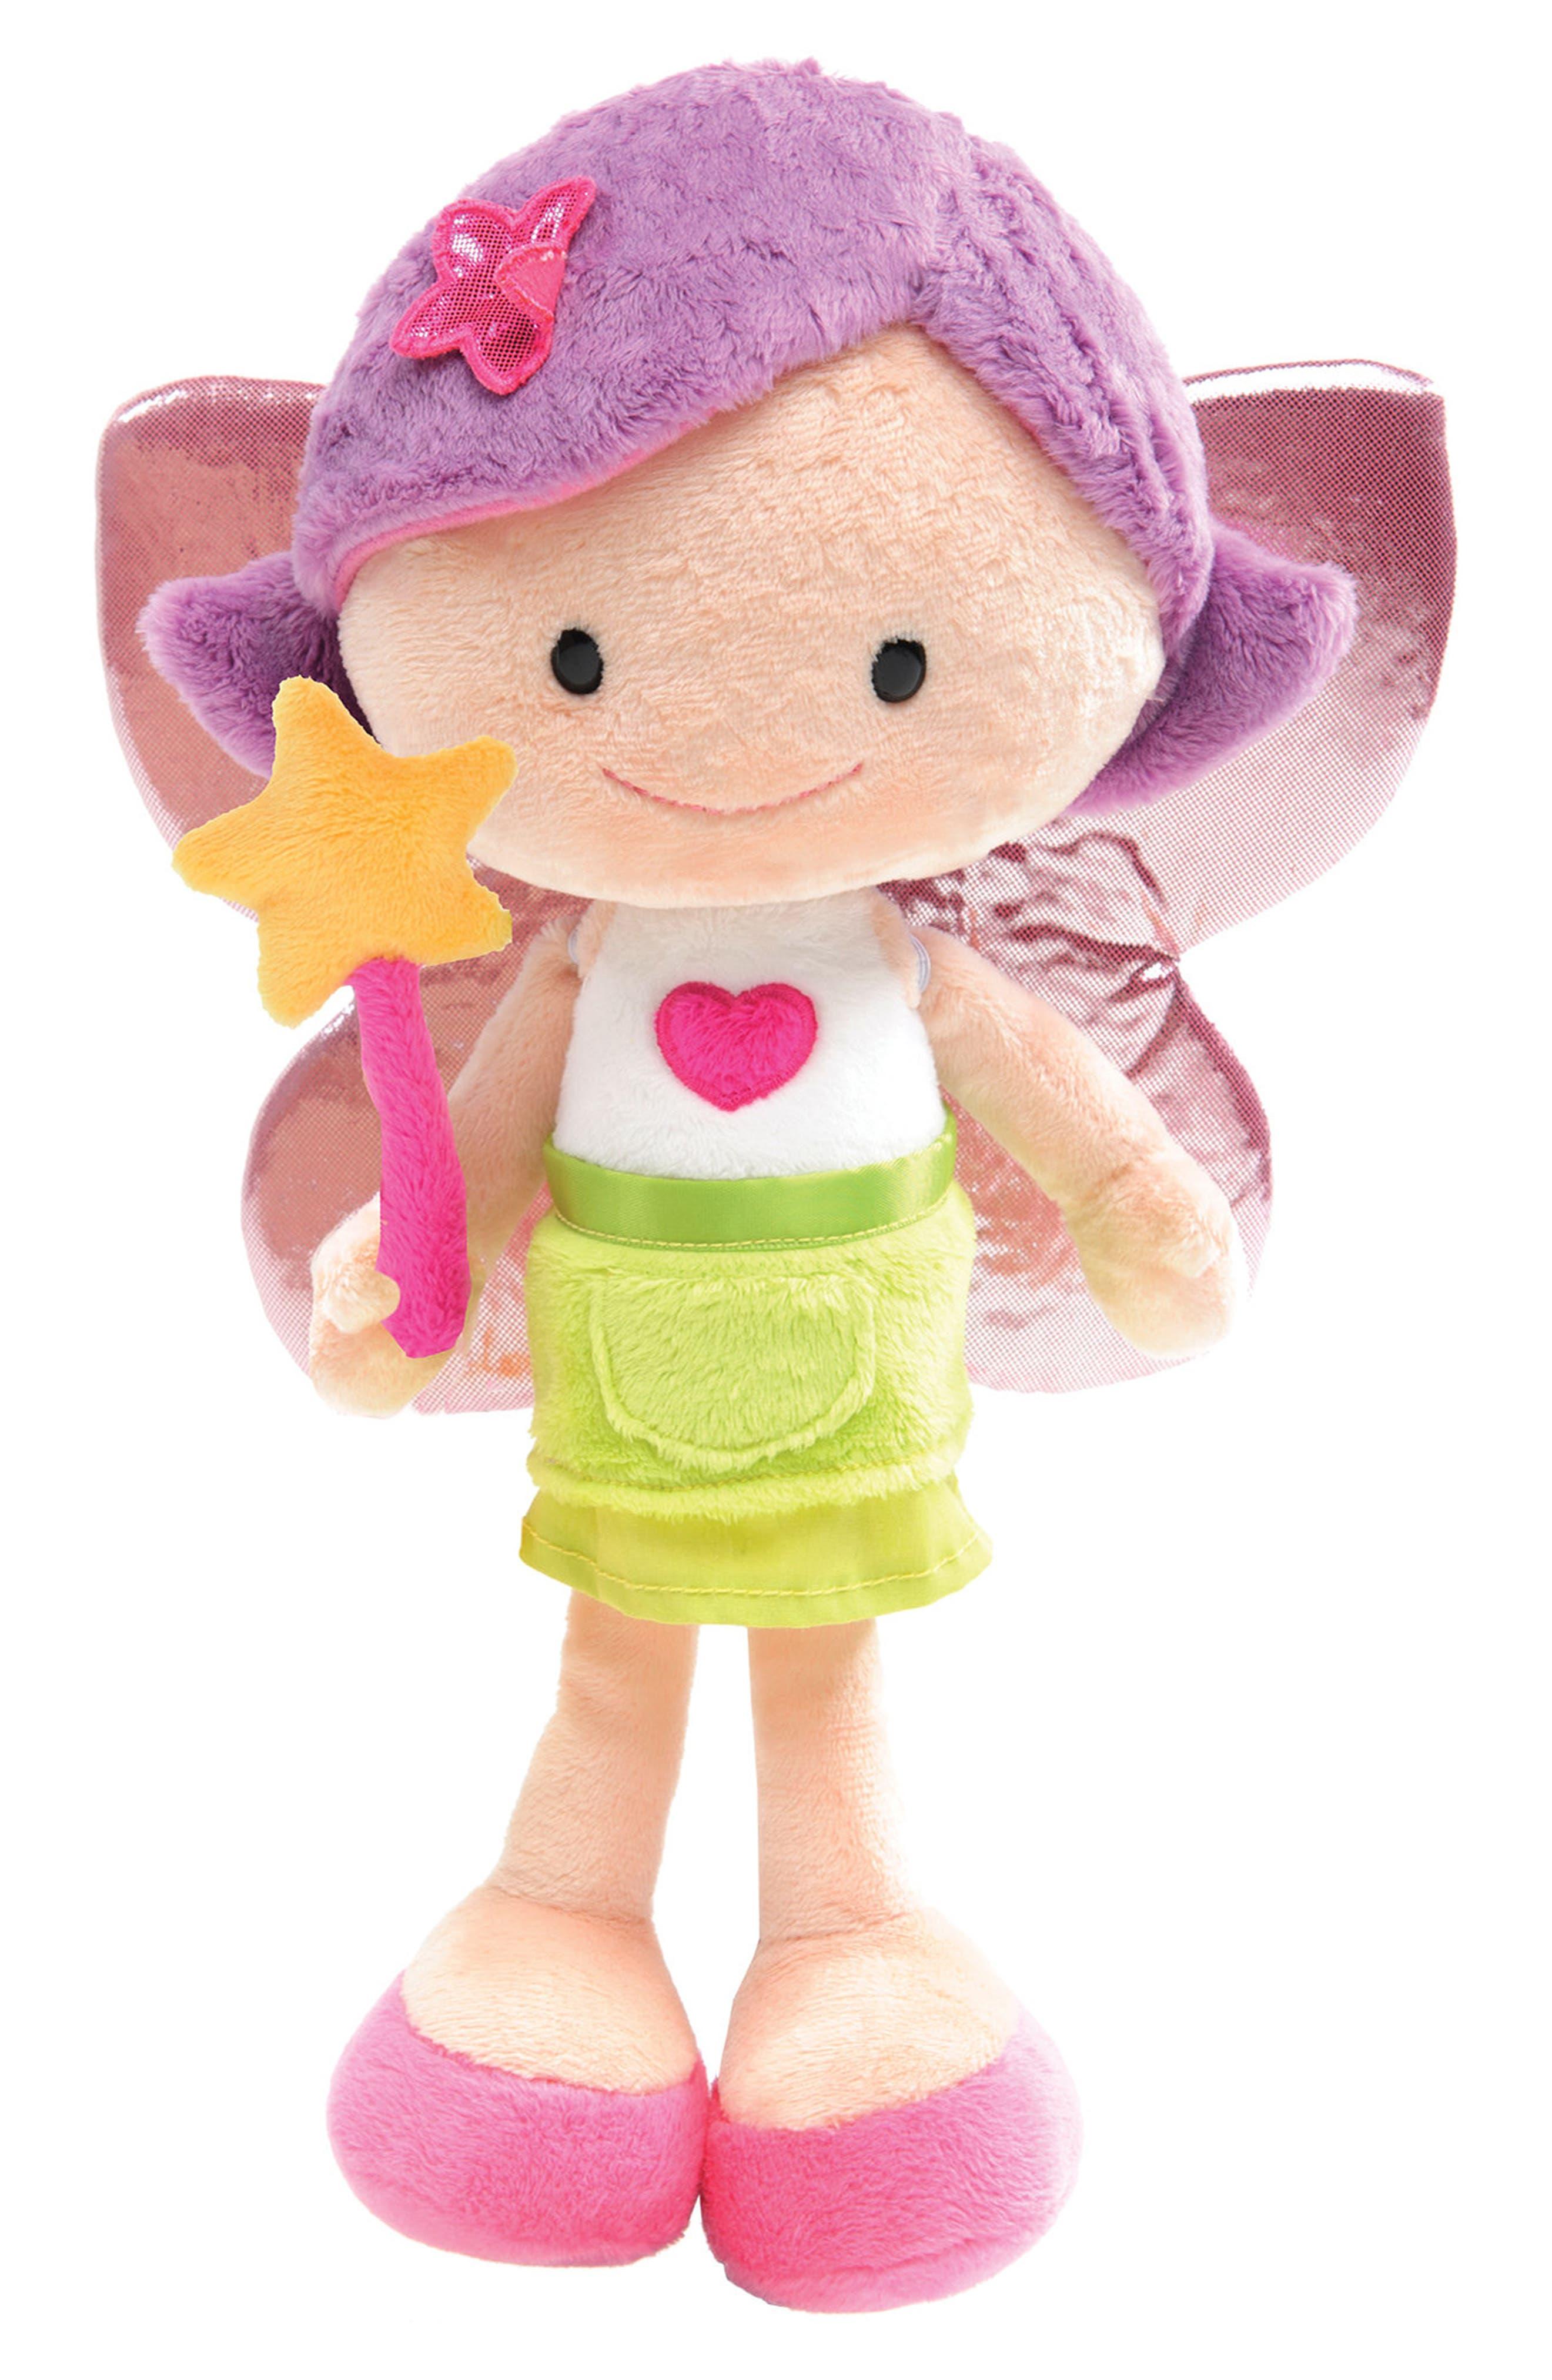 Alternate Image 1 Selected - Neat Oh! Nici® Wonderland Minimorgan the Fairy Plush Doll